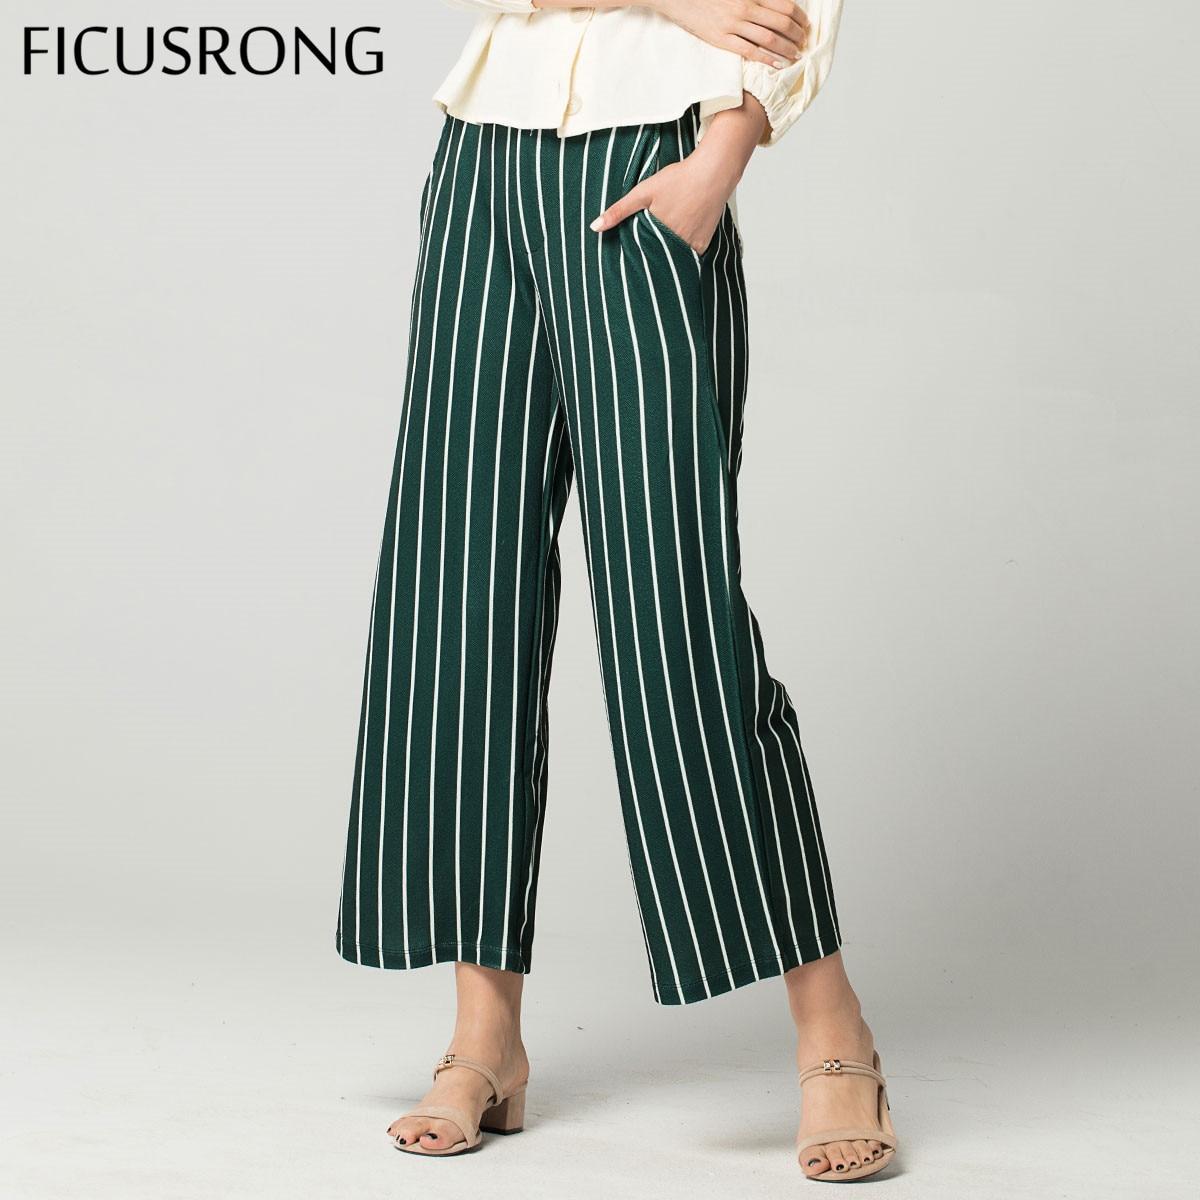 Women Fashion Summer Loose Ankle-Length   Pants   Casual   Wide     Leg     Pant   Female Green Stripe Elastic Waist Trousers FICUSRONG